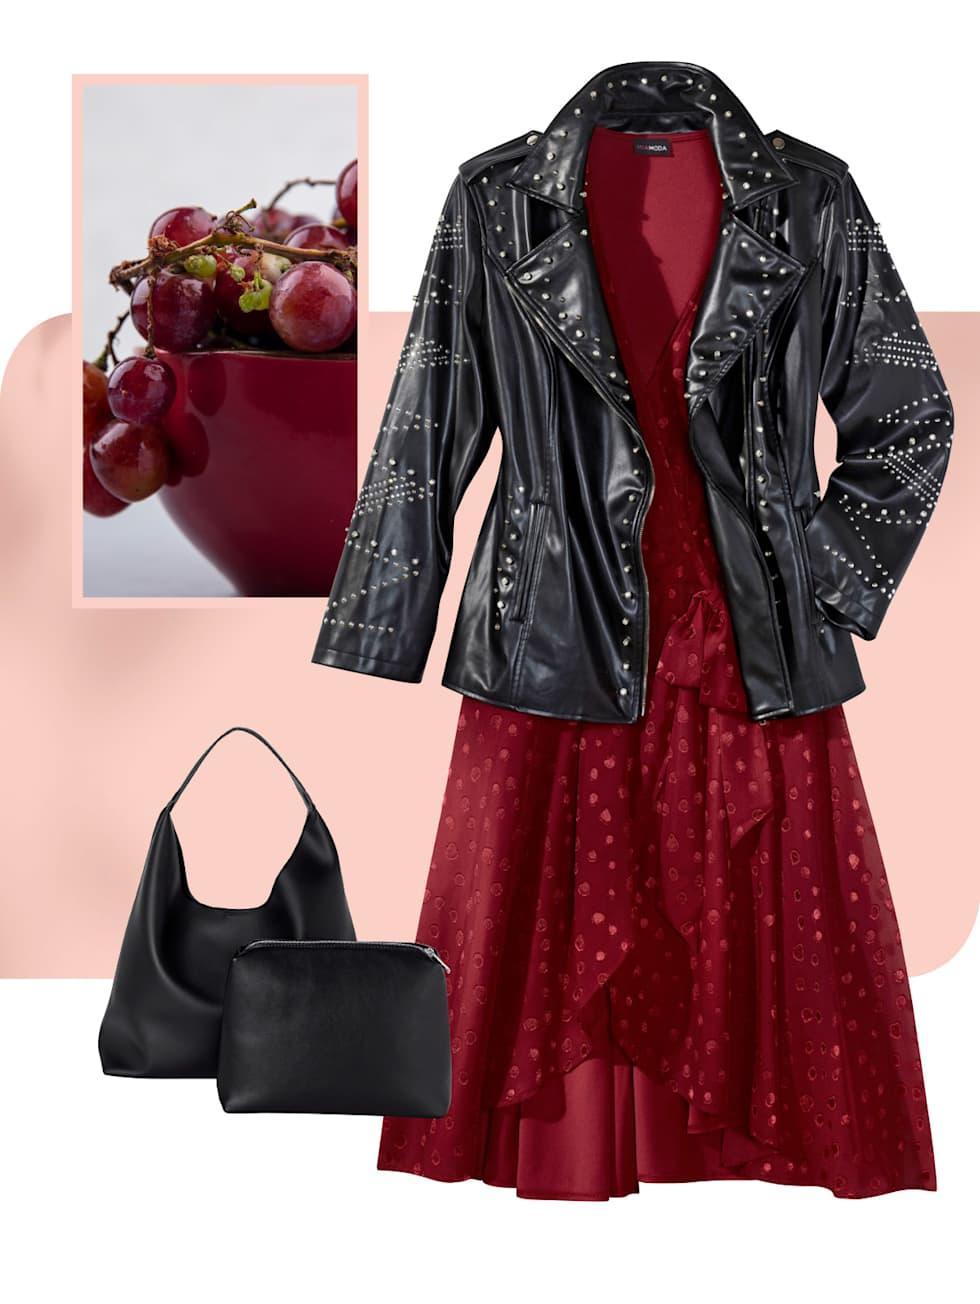 MIAMODA Grosse Grössen Kampagne strahlende Farben - Outfit in der Farbe rot